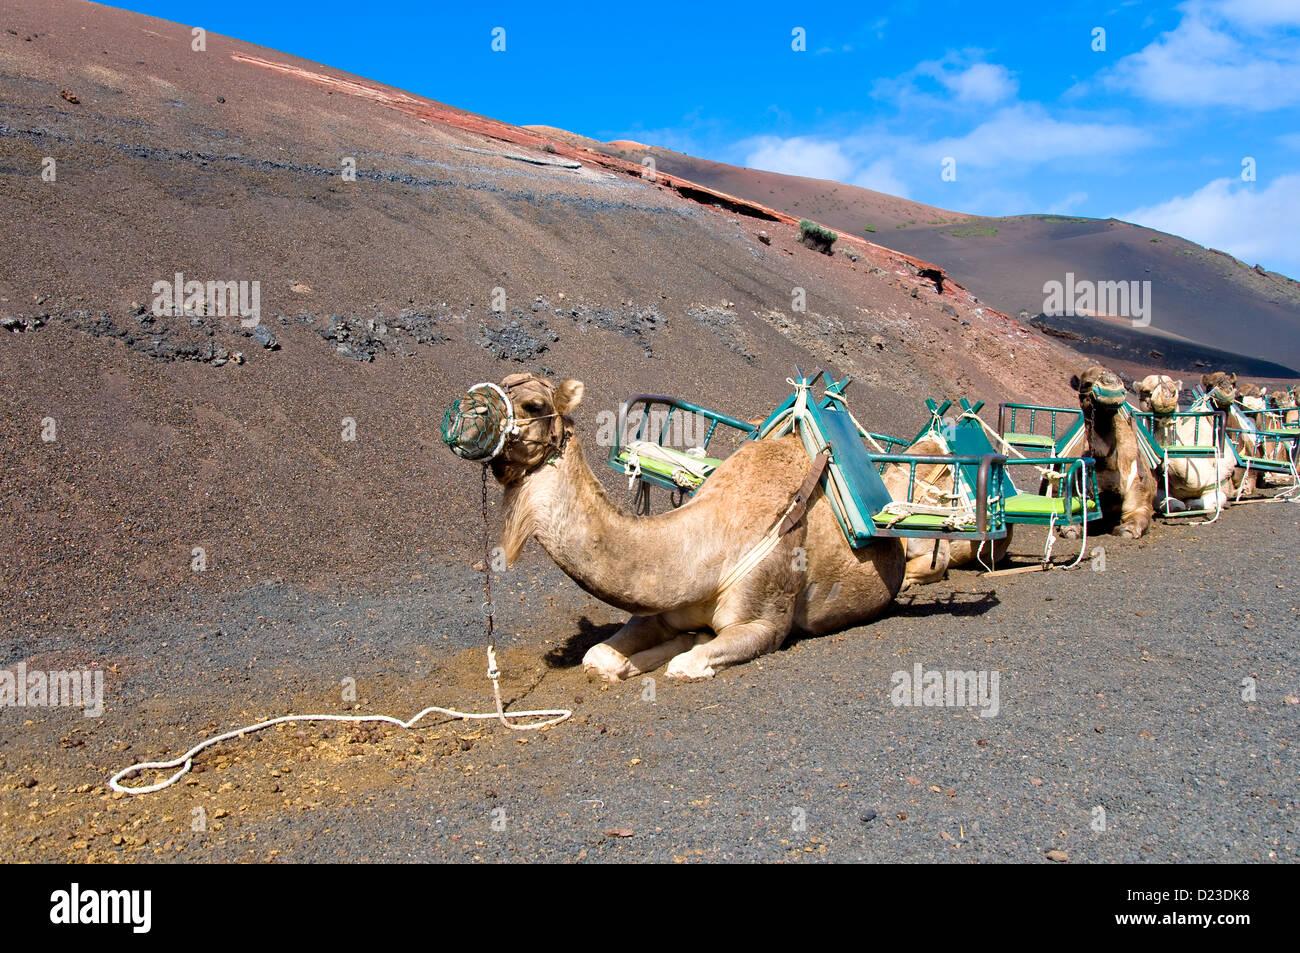 Camel Safari, Timanfaya National Park, Lanzarote, Canary Islands, Spain - Stock Image